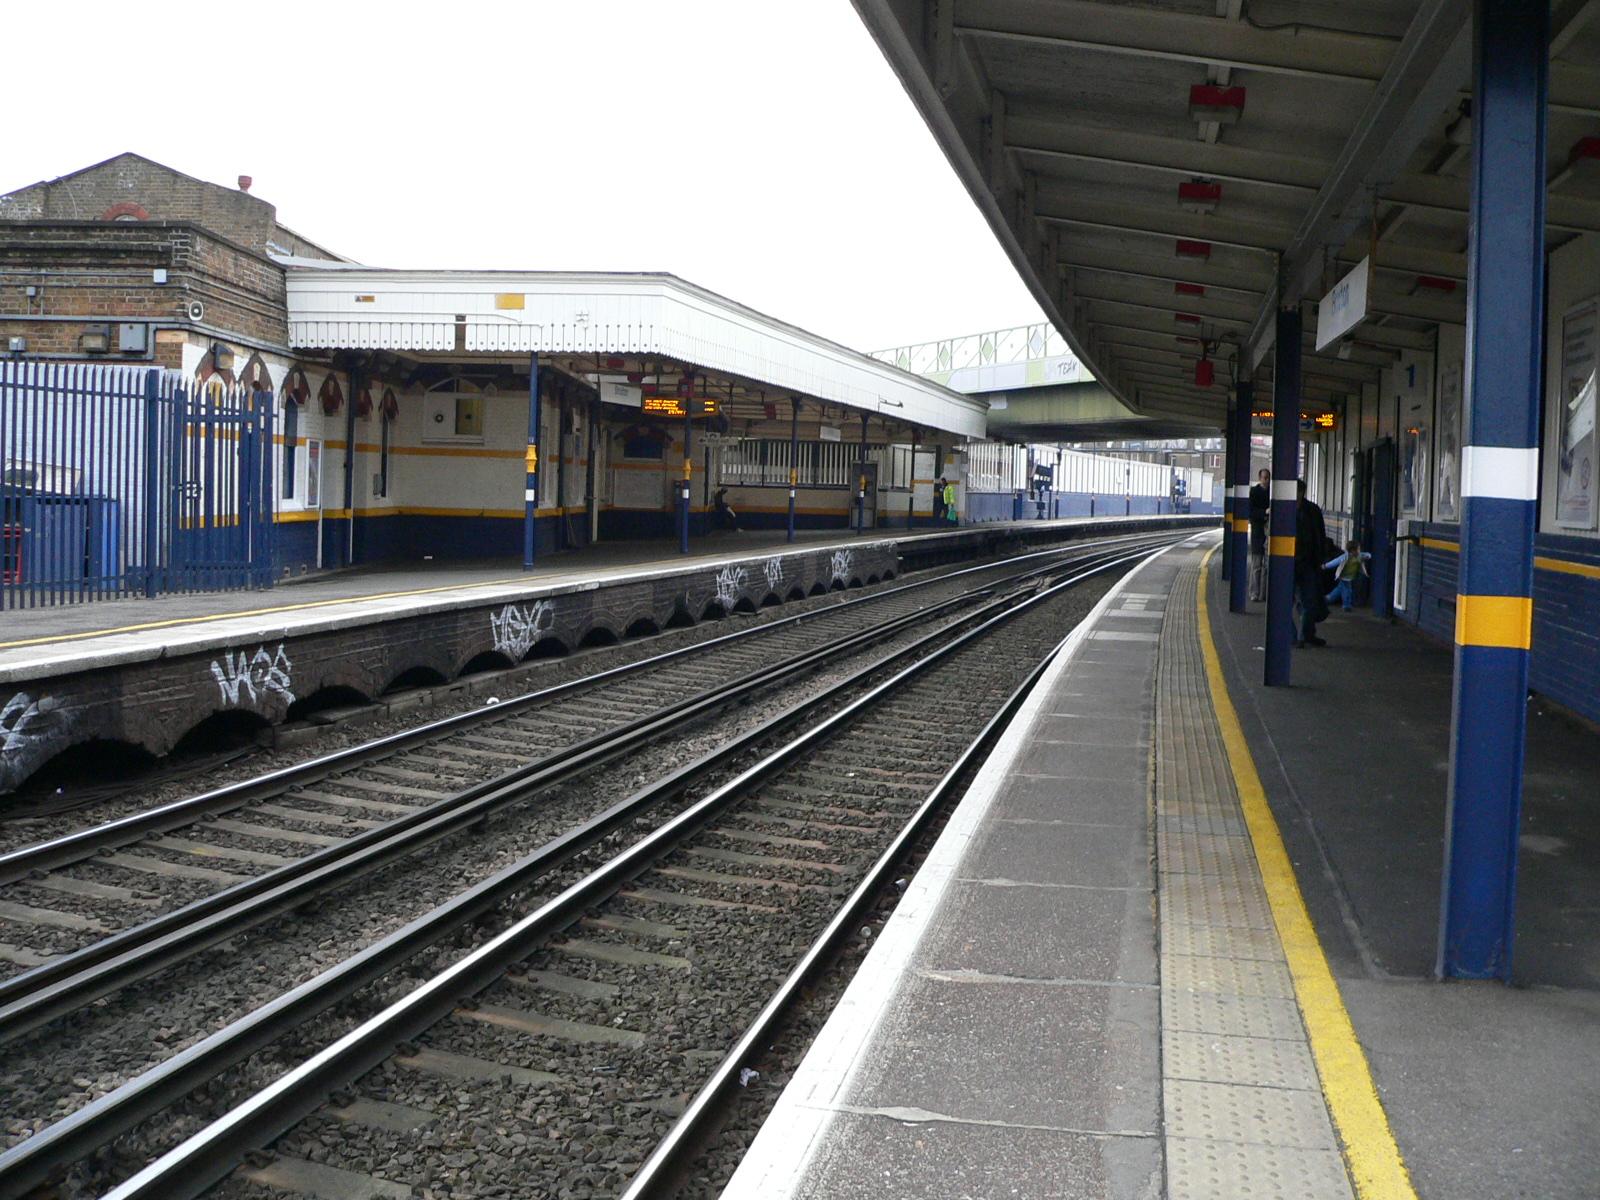 File:Brixton railway station 02.jpg - Wikimedia Commons